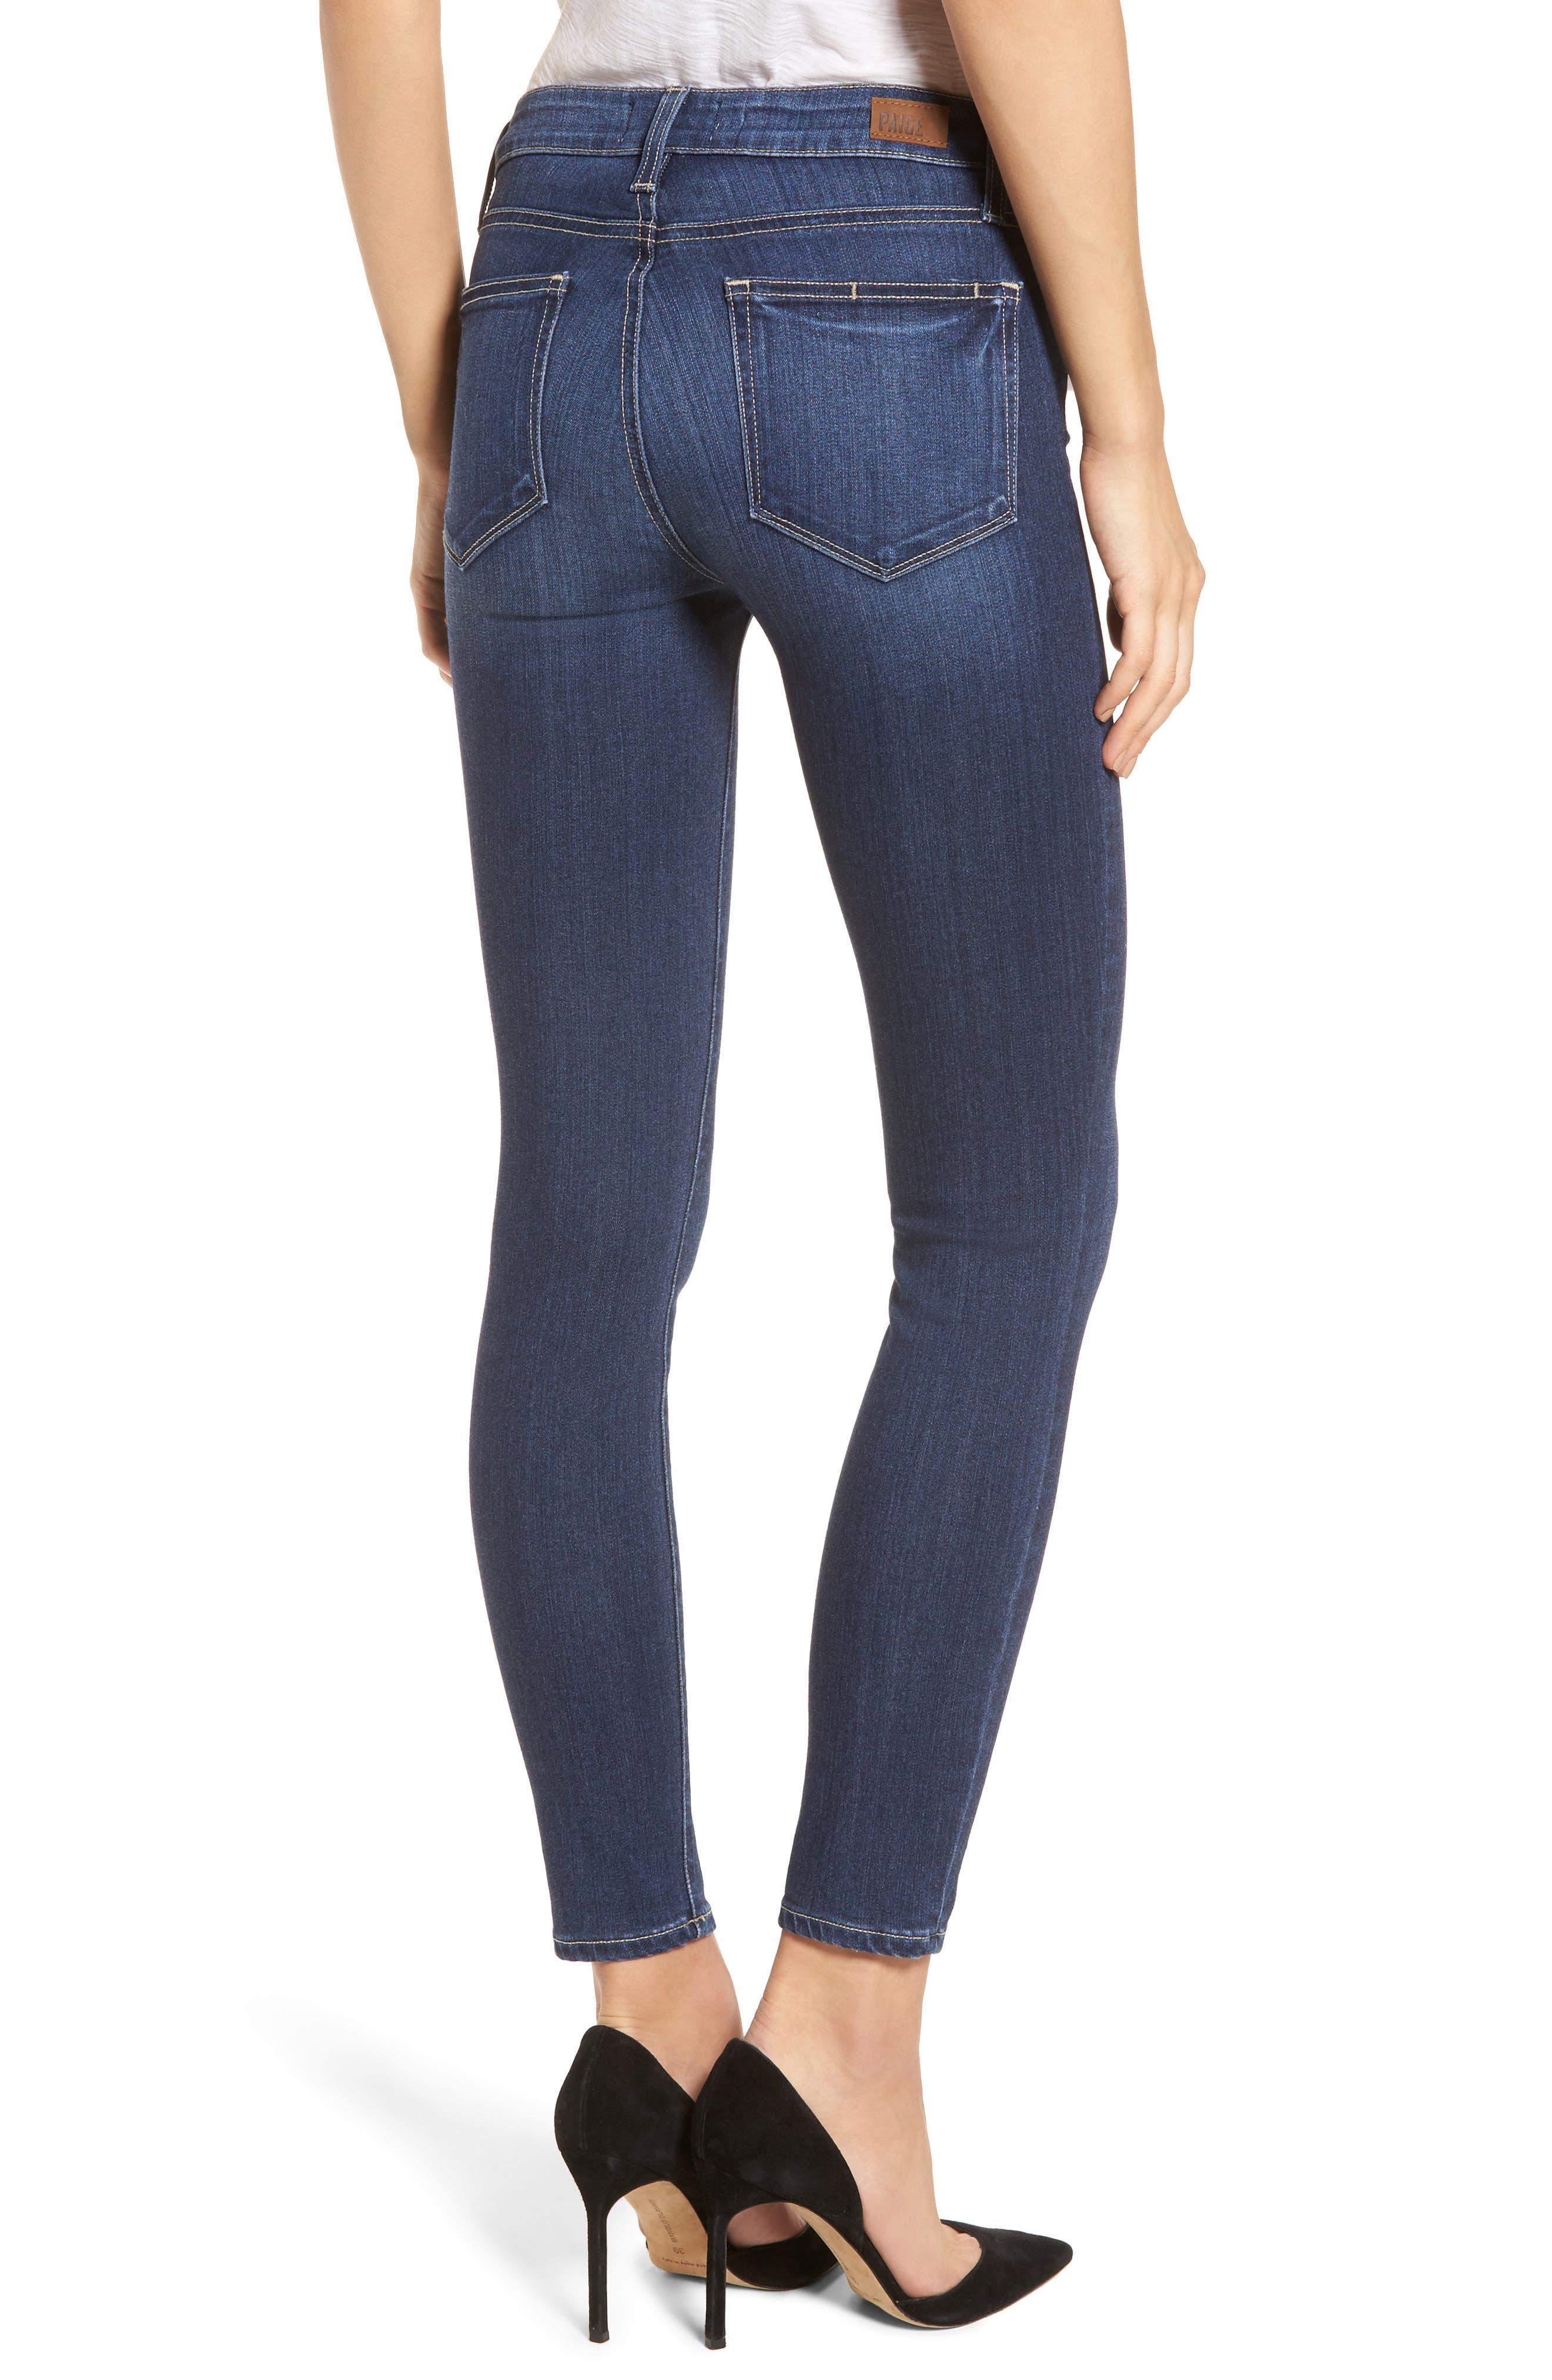 Transcend - Verdugo Ankle Skinny Jeans,                             Alternate thumbnail 2, color,